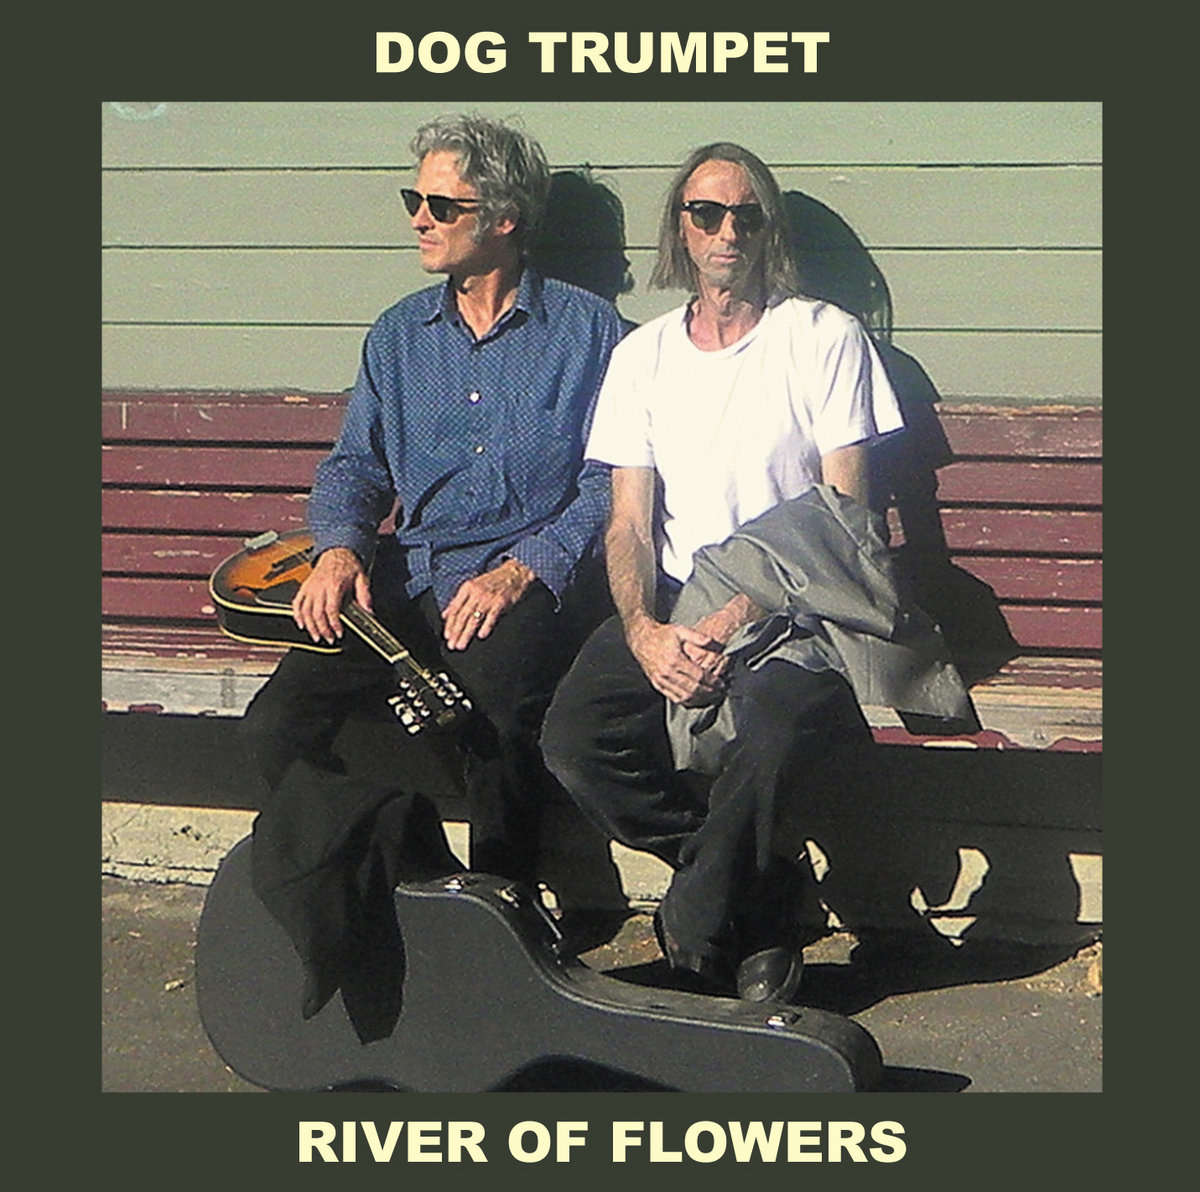 the wilson home for crippled children dog trumpet